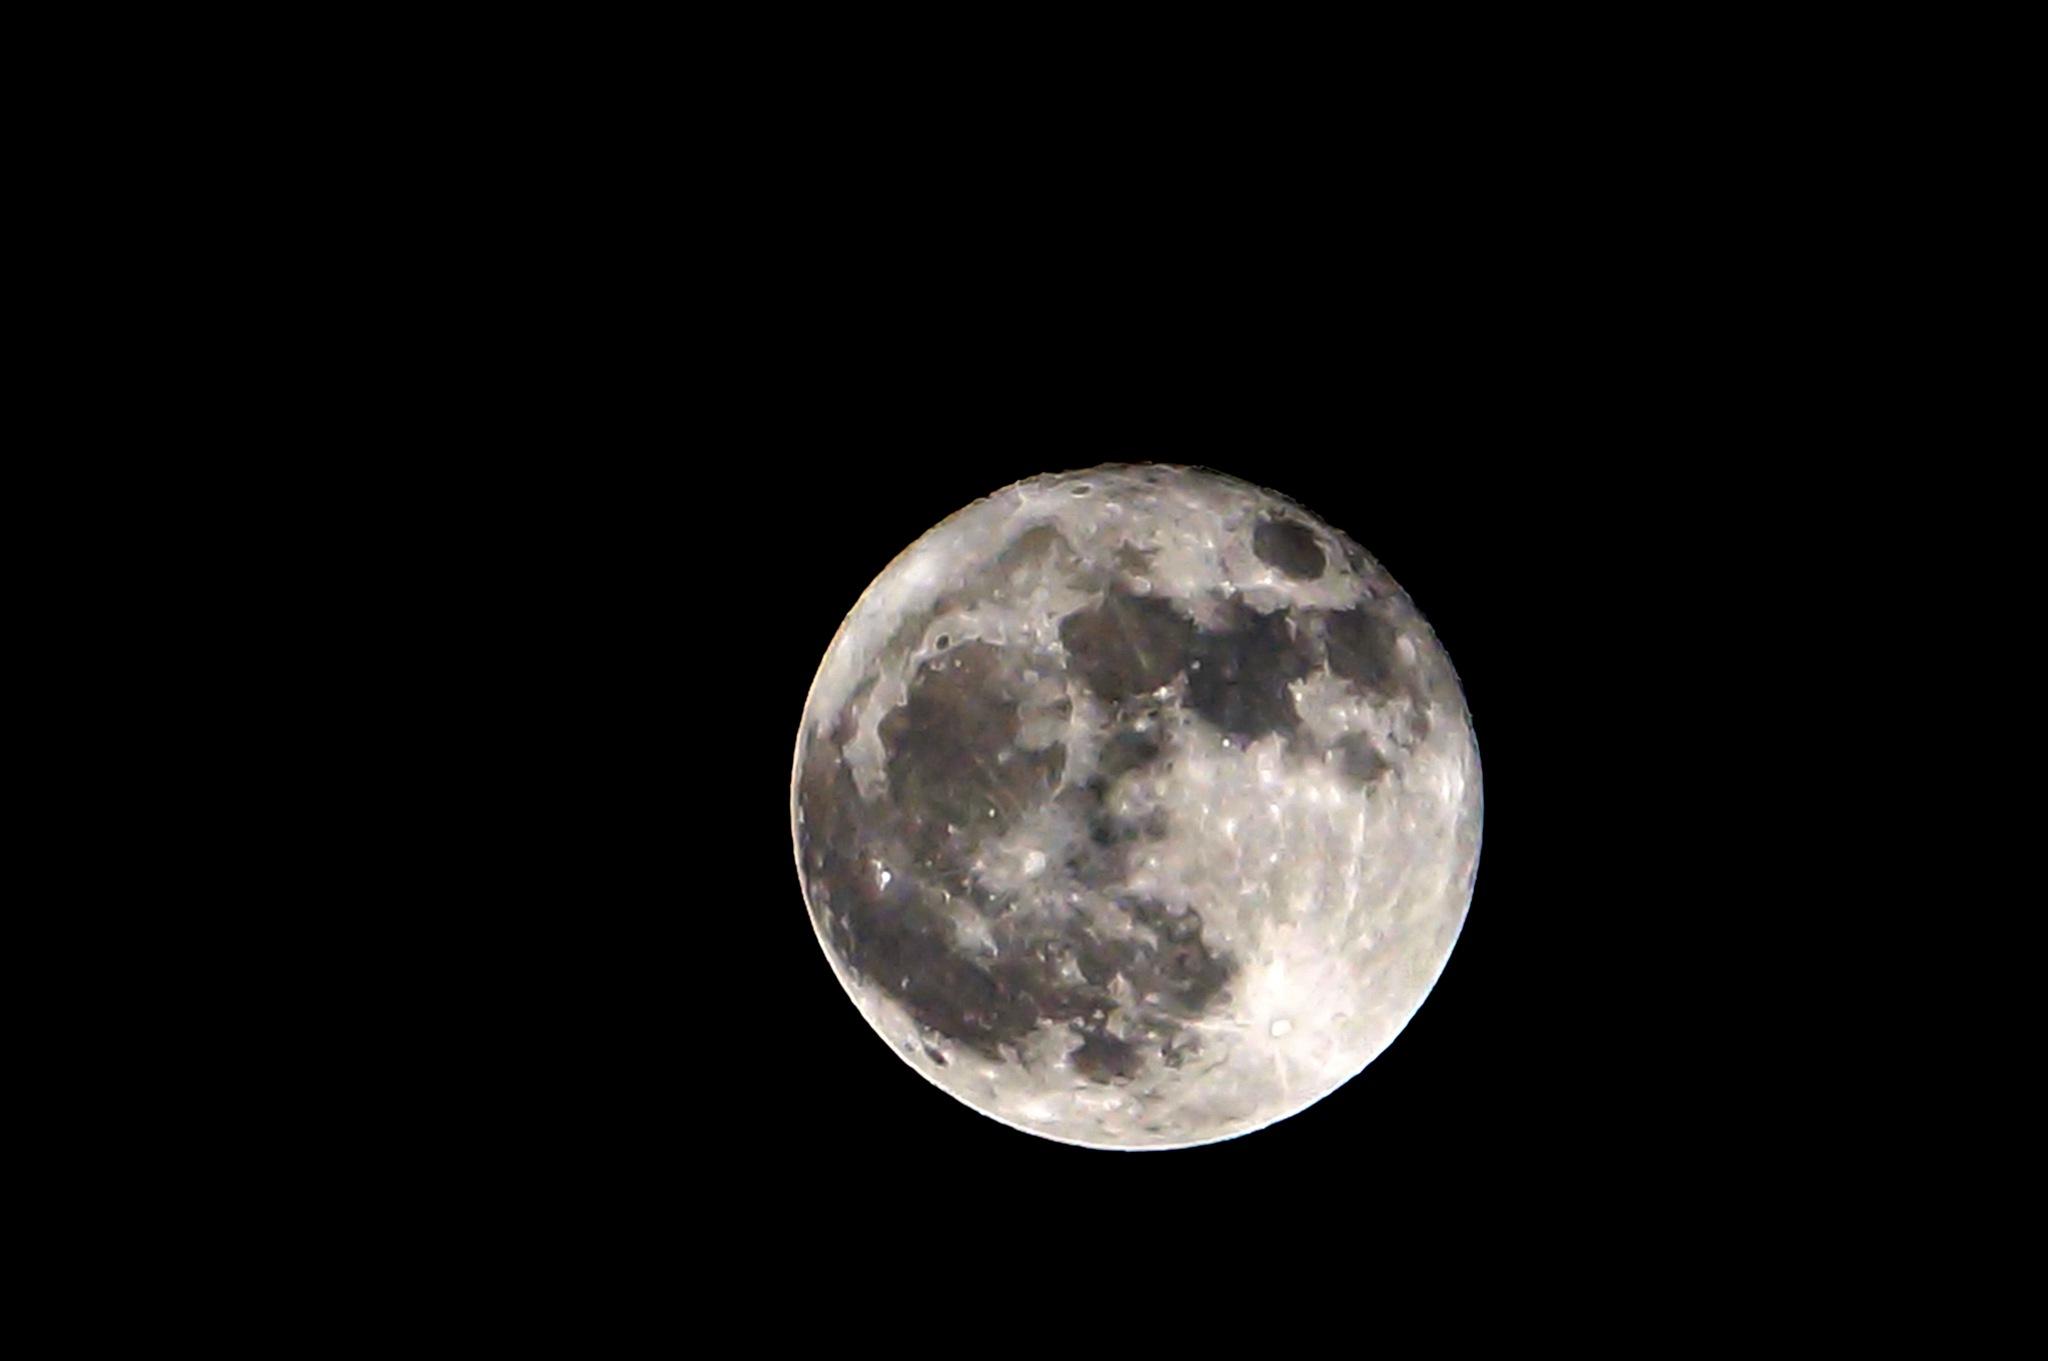 The full moon by Suresh Tewari